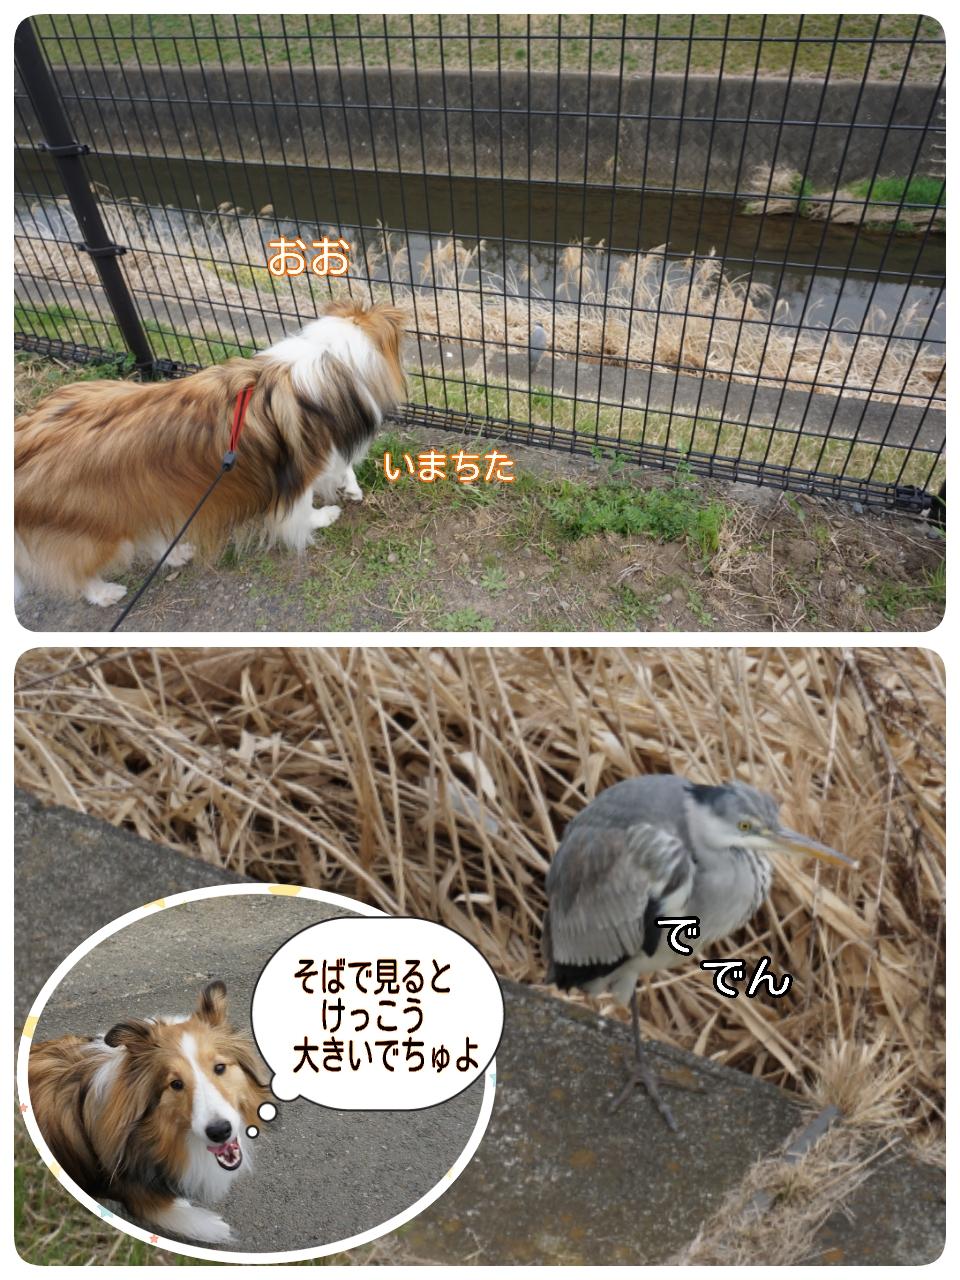 2015-04-01-14-37-25_deco.jpg